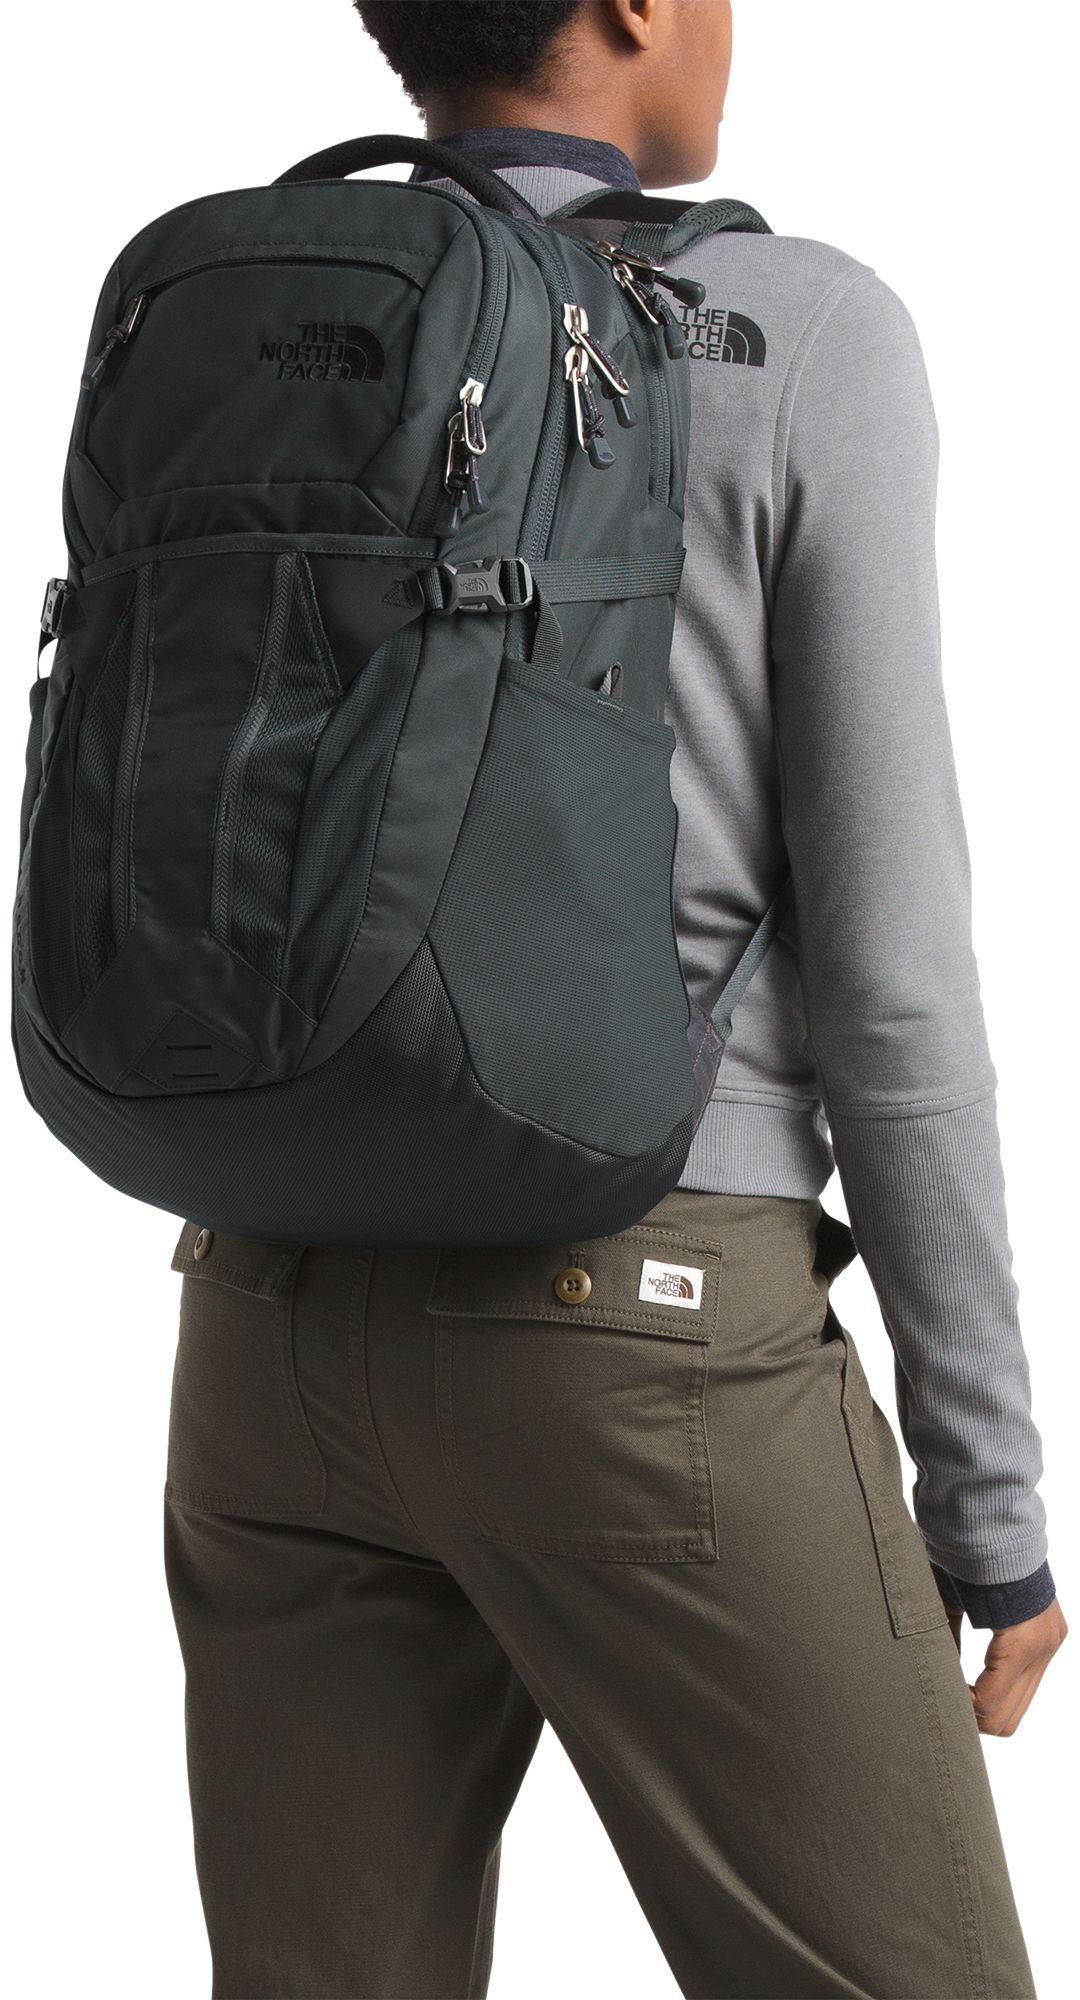 north face rucksack recon